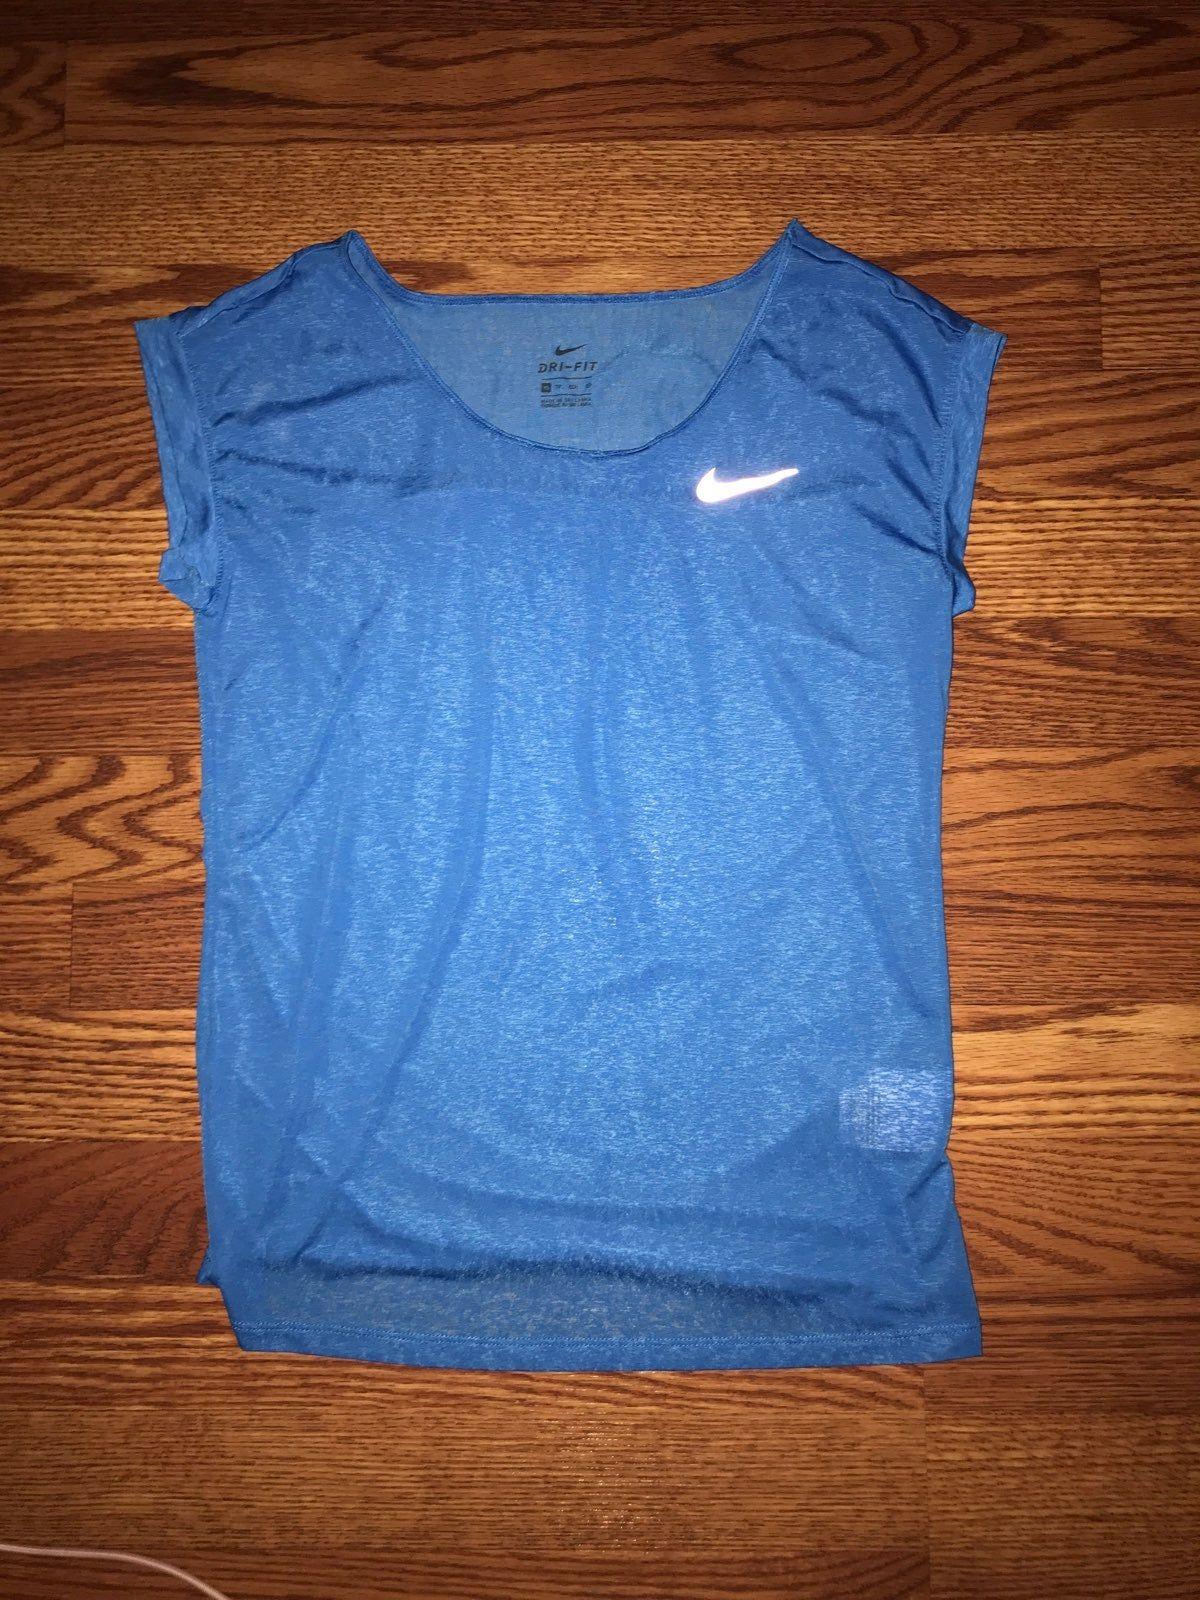 Nike Dri Fit T Shirt Light Sky Blue Size Xs Worn Once Dri Fit T Shirts Nike Dri Fit Shirts